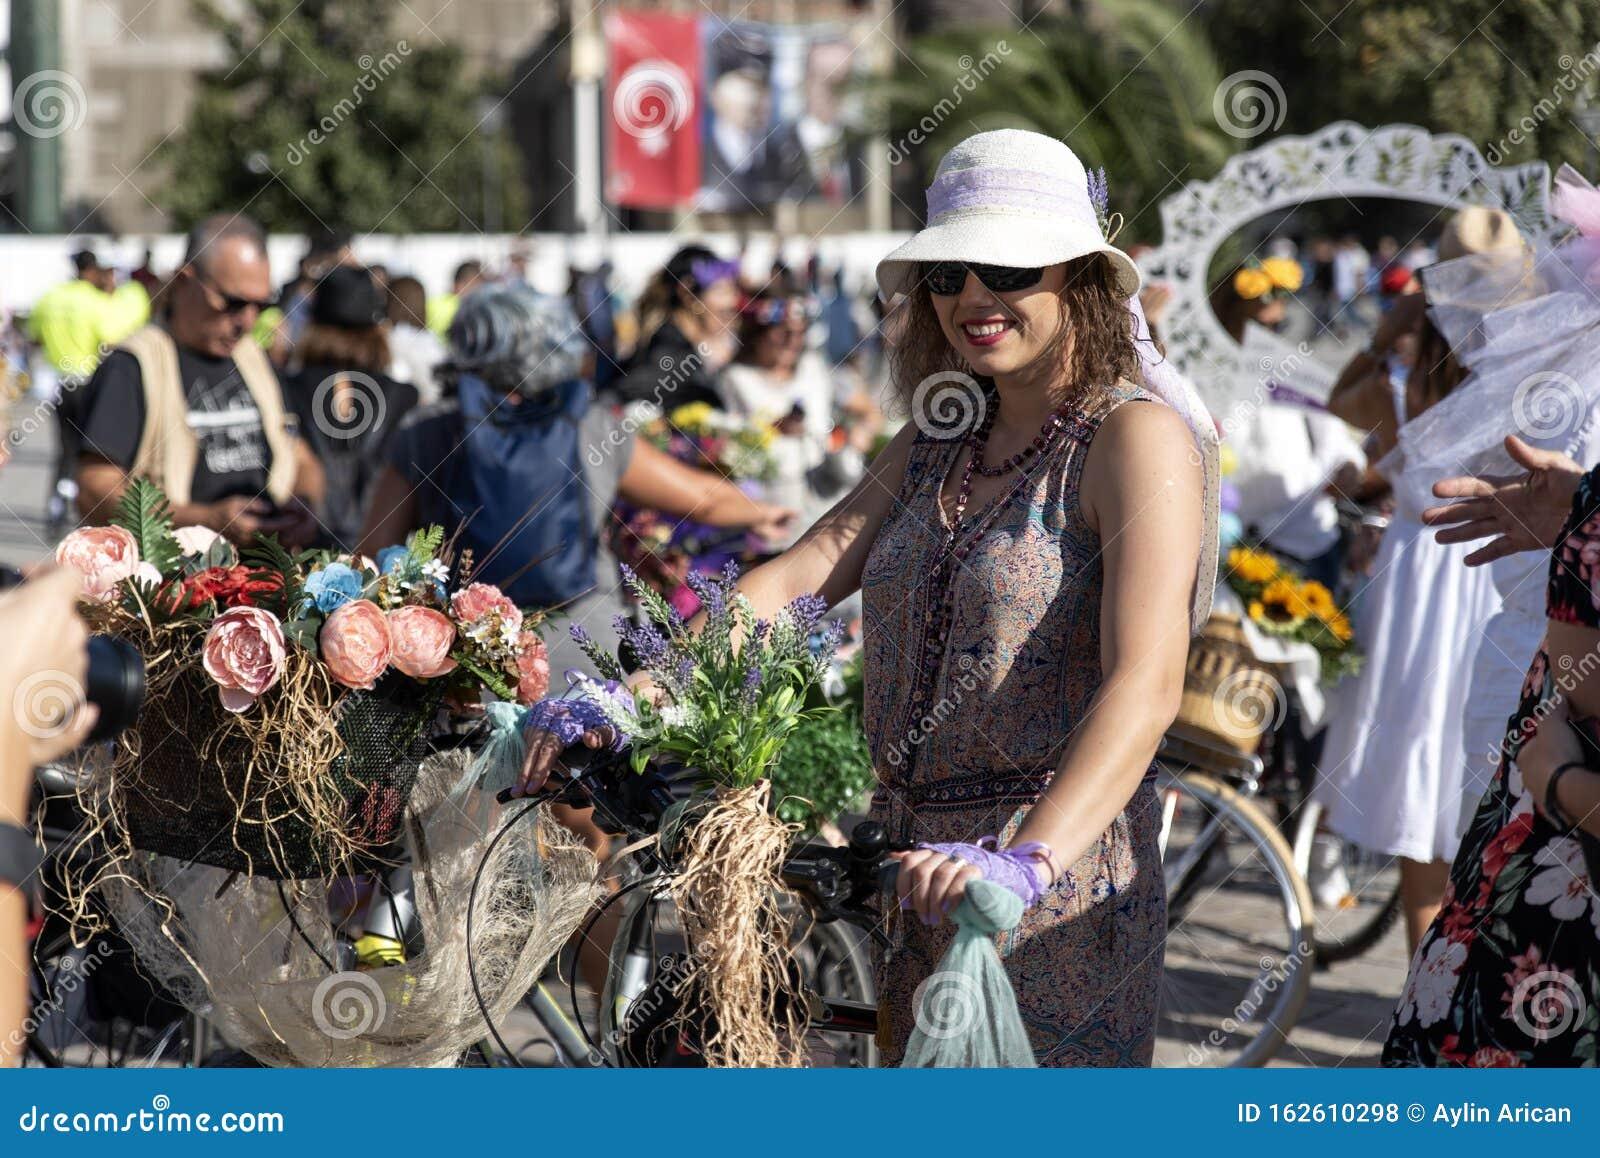 Fancy Women Bike Ride Women S Cycling Activity Editorial Stock Photo Image Of Beauty Decoration 162610298